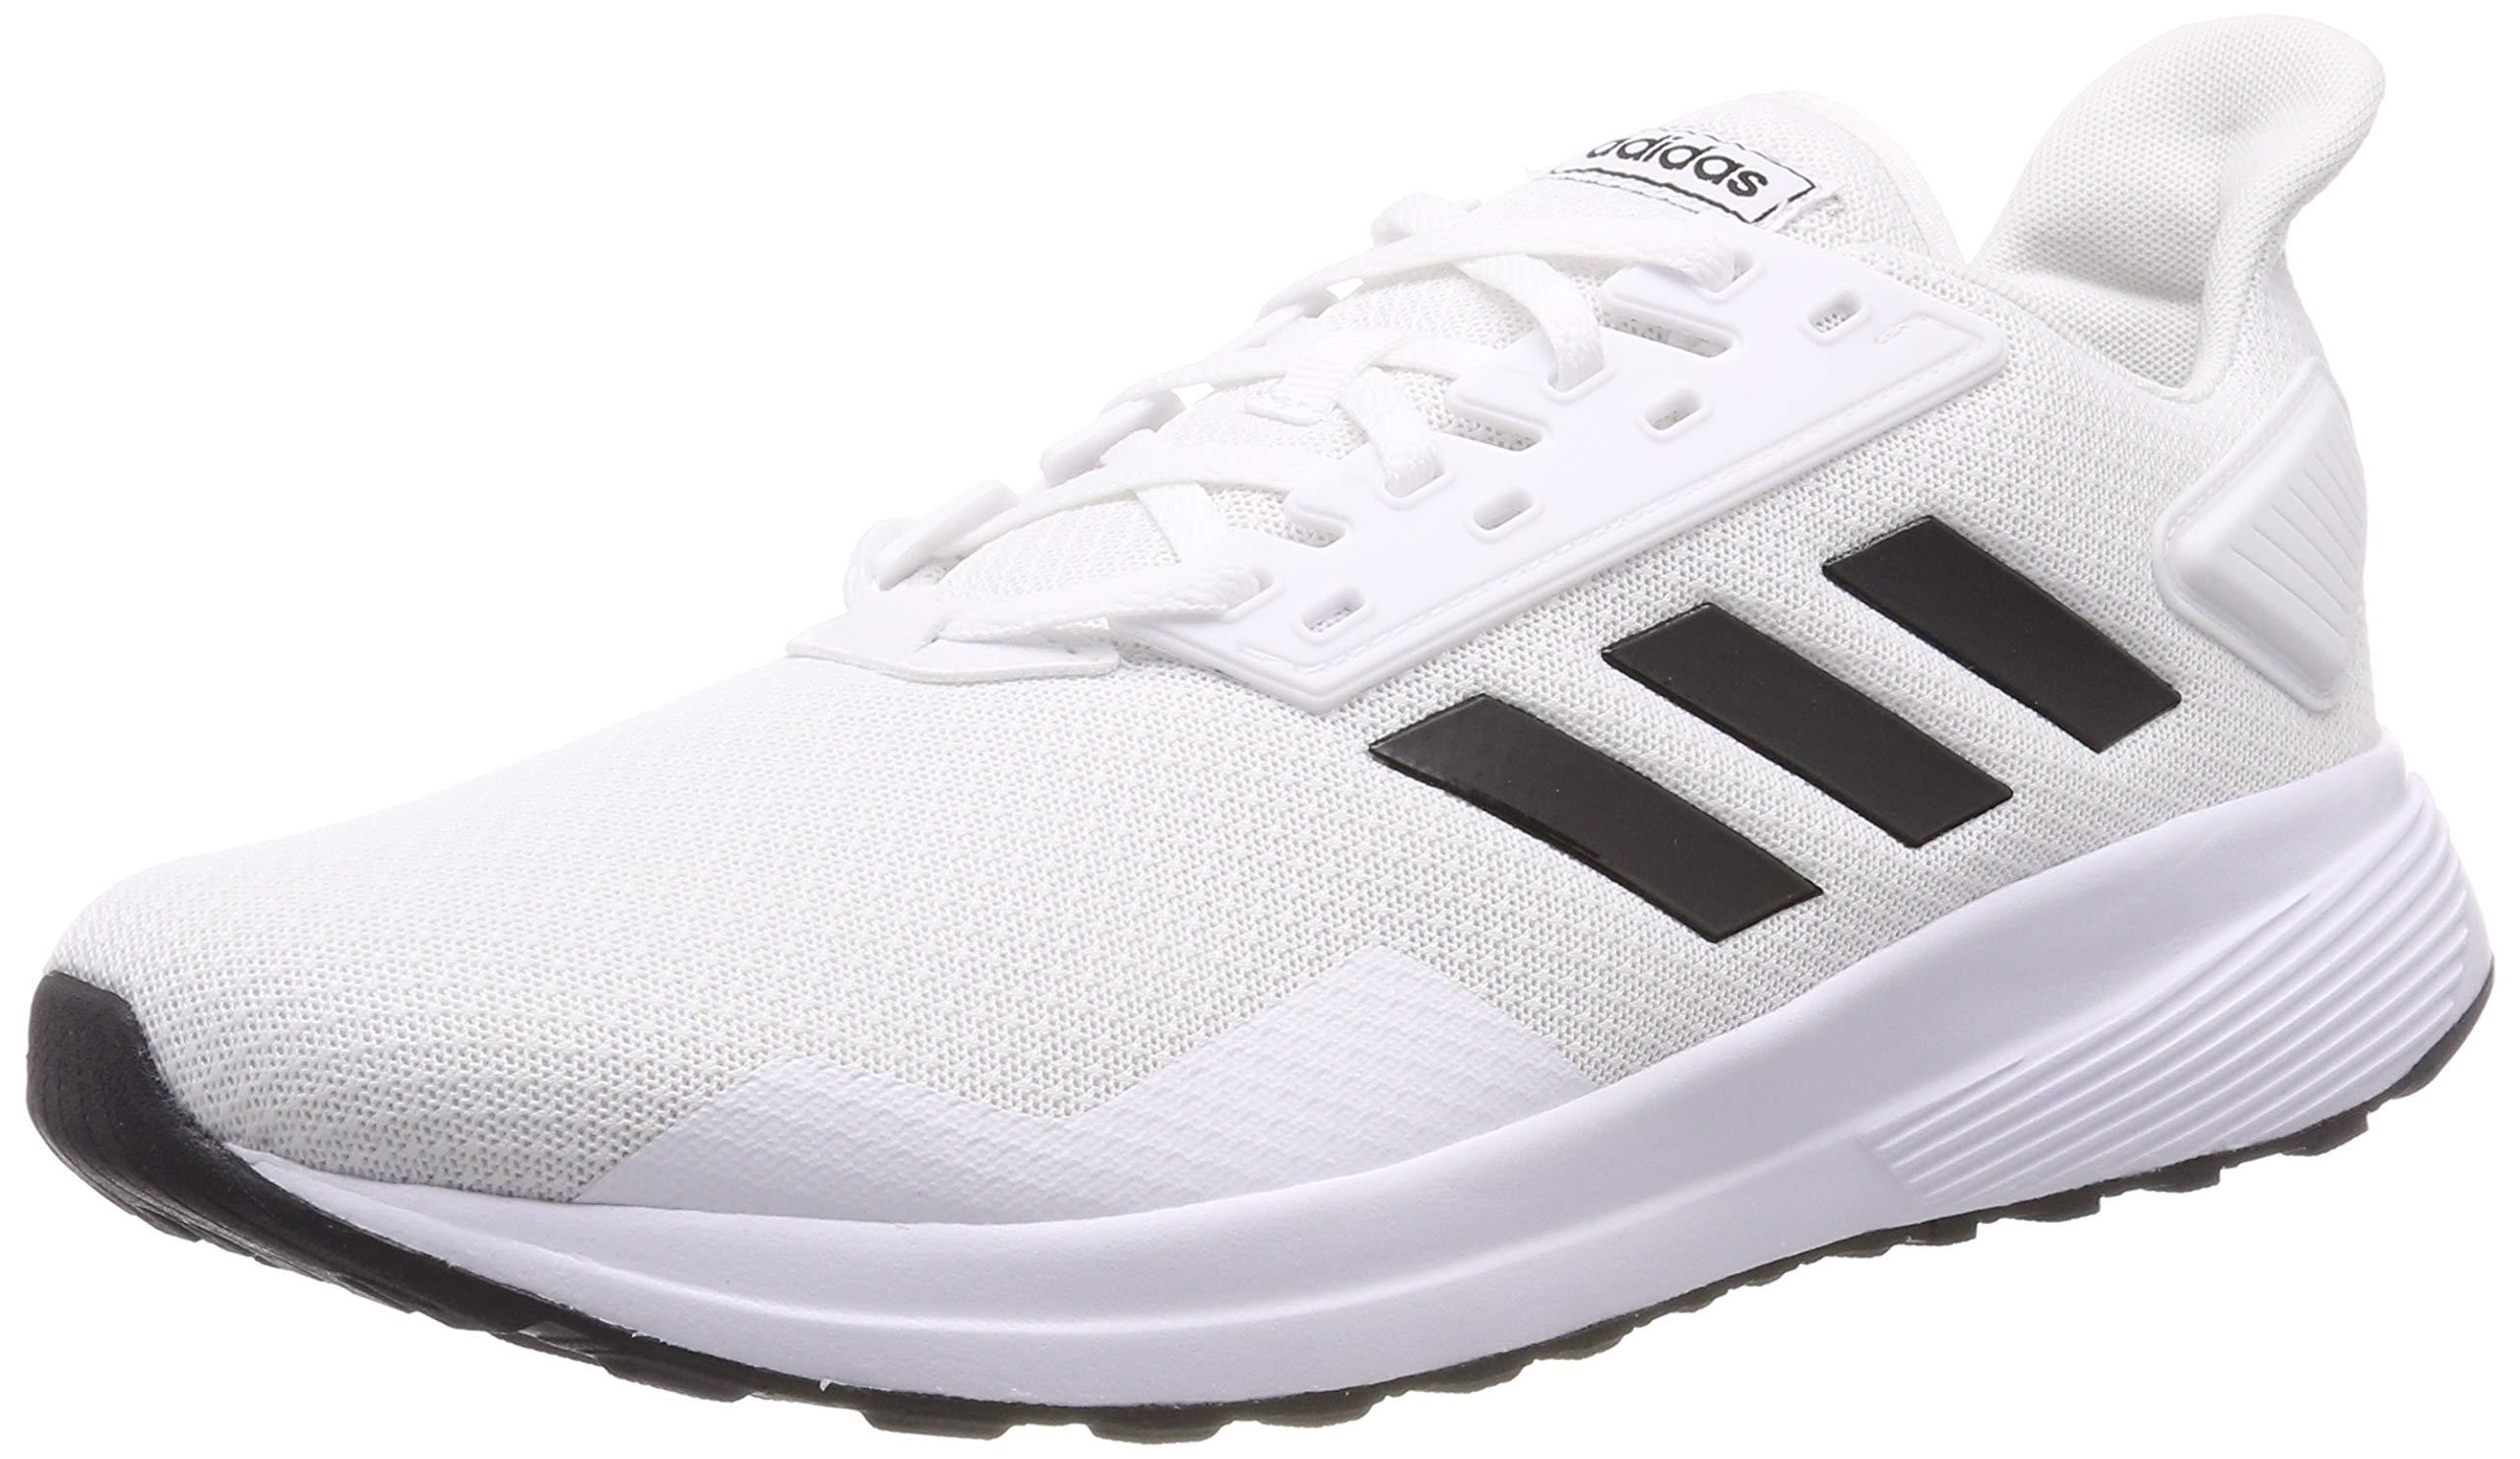 adidas Men Shoes Duramo 9 Core Training Fitness Trainers Road Running New (EU 39 1/3 - UK 6 - US 6.5) White